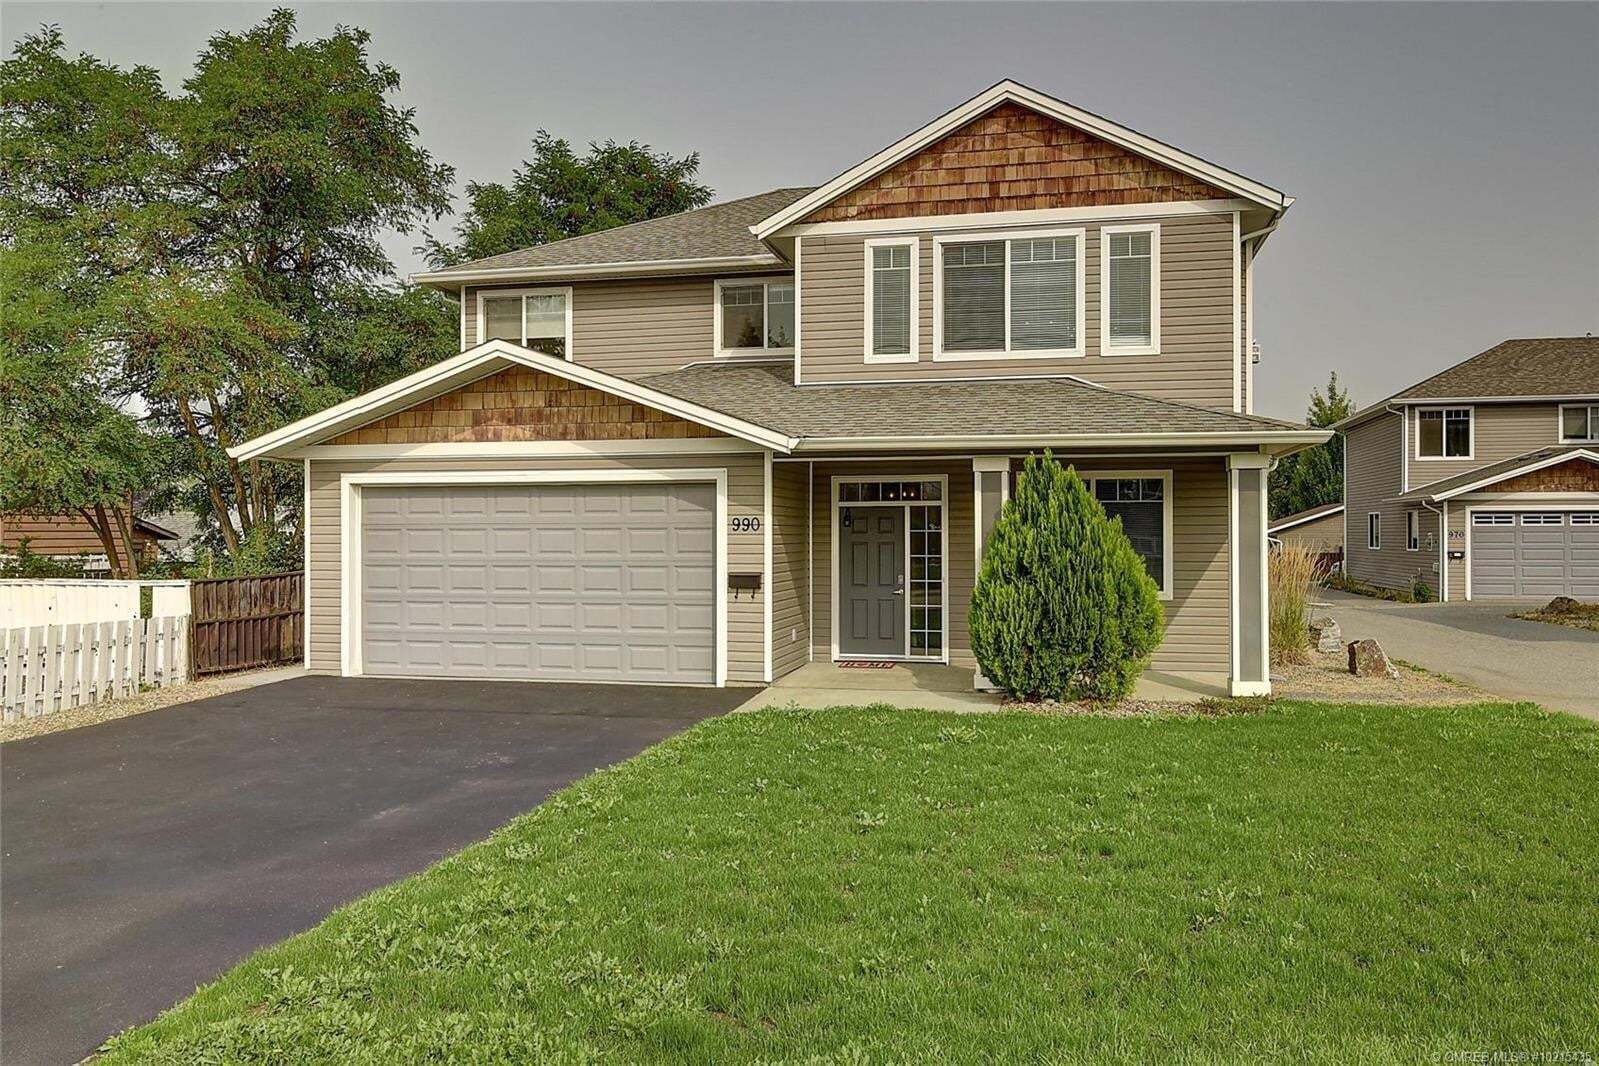 House for sale at 990 Graham Rd Kelowna British Columbia - MLS: 10215435